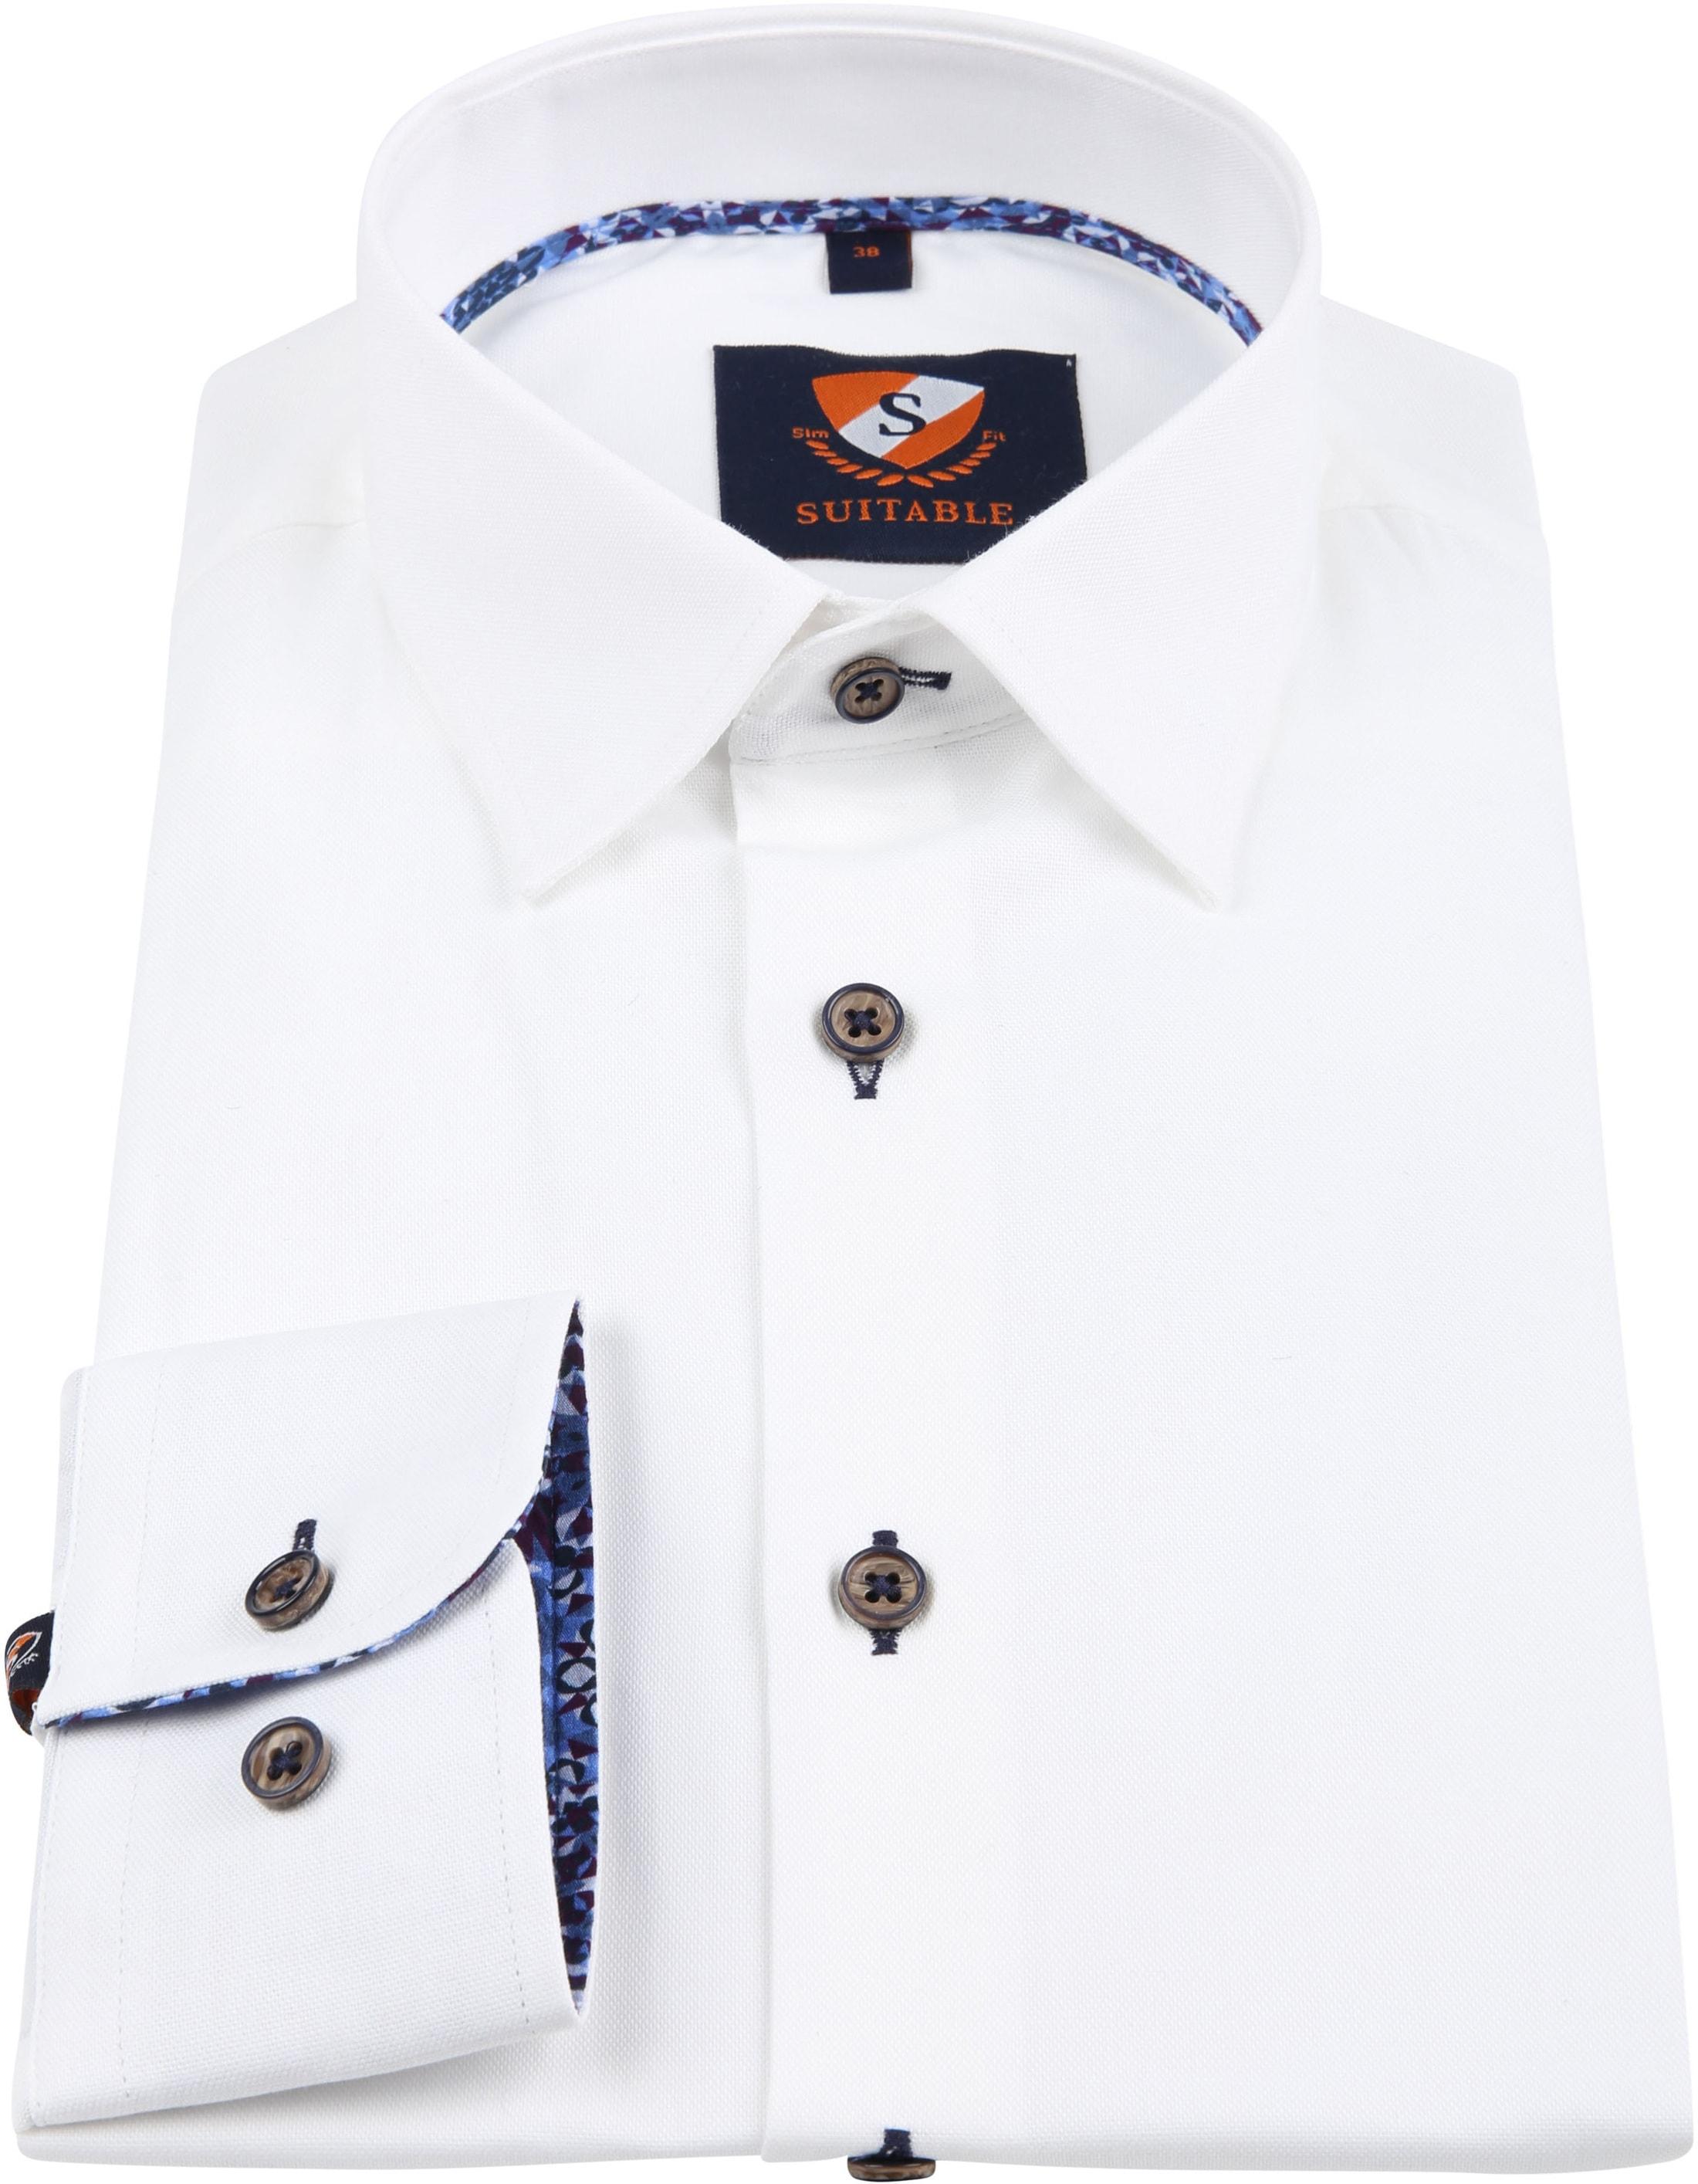 Suitable Overhemd Wit 188-1 foto 2